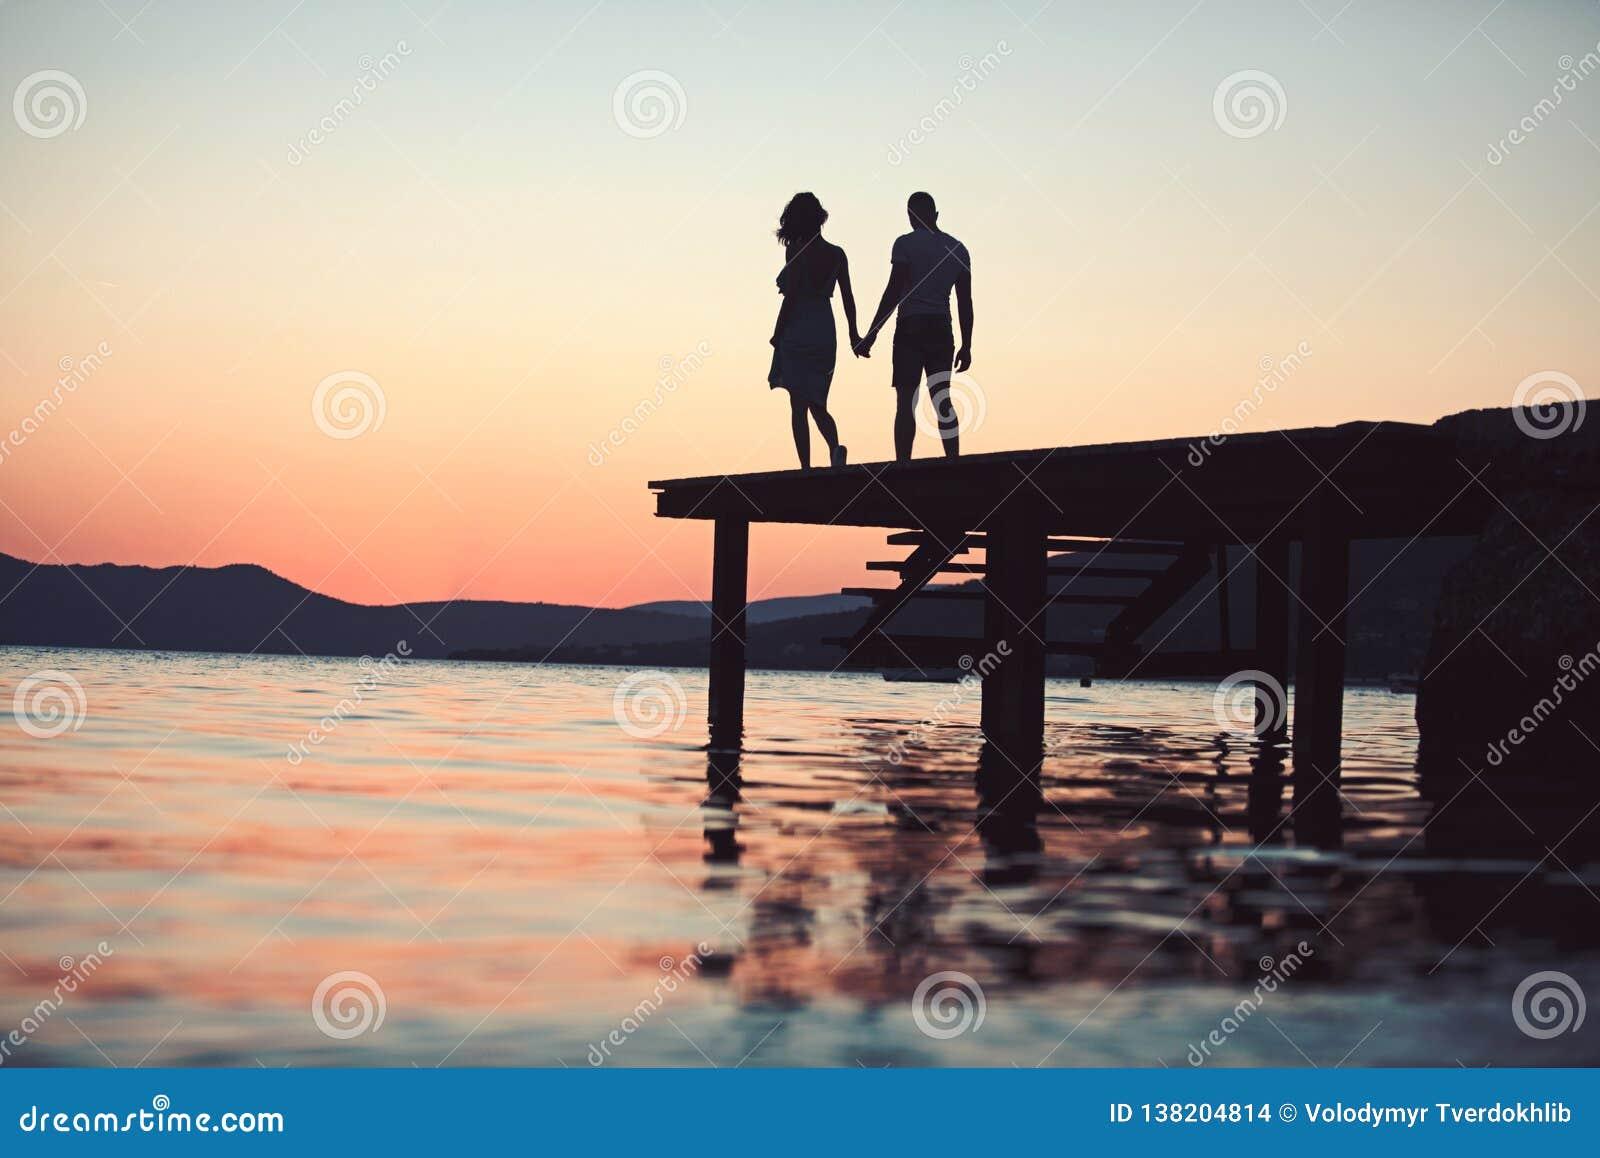 Dusk Couple Silhouette On Pier At Sea Water Dusk Couple